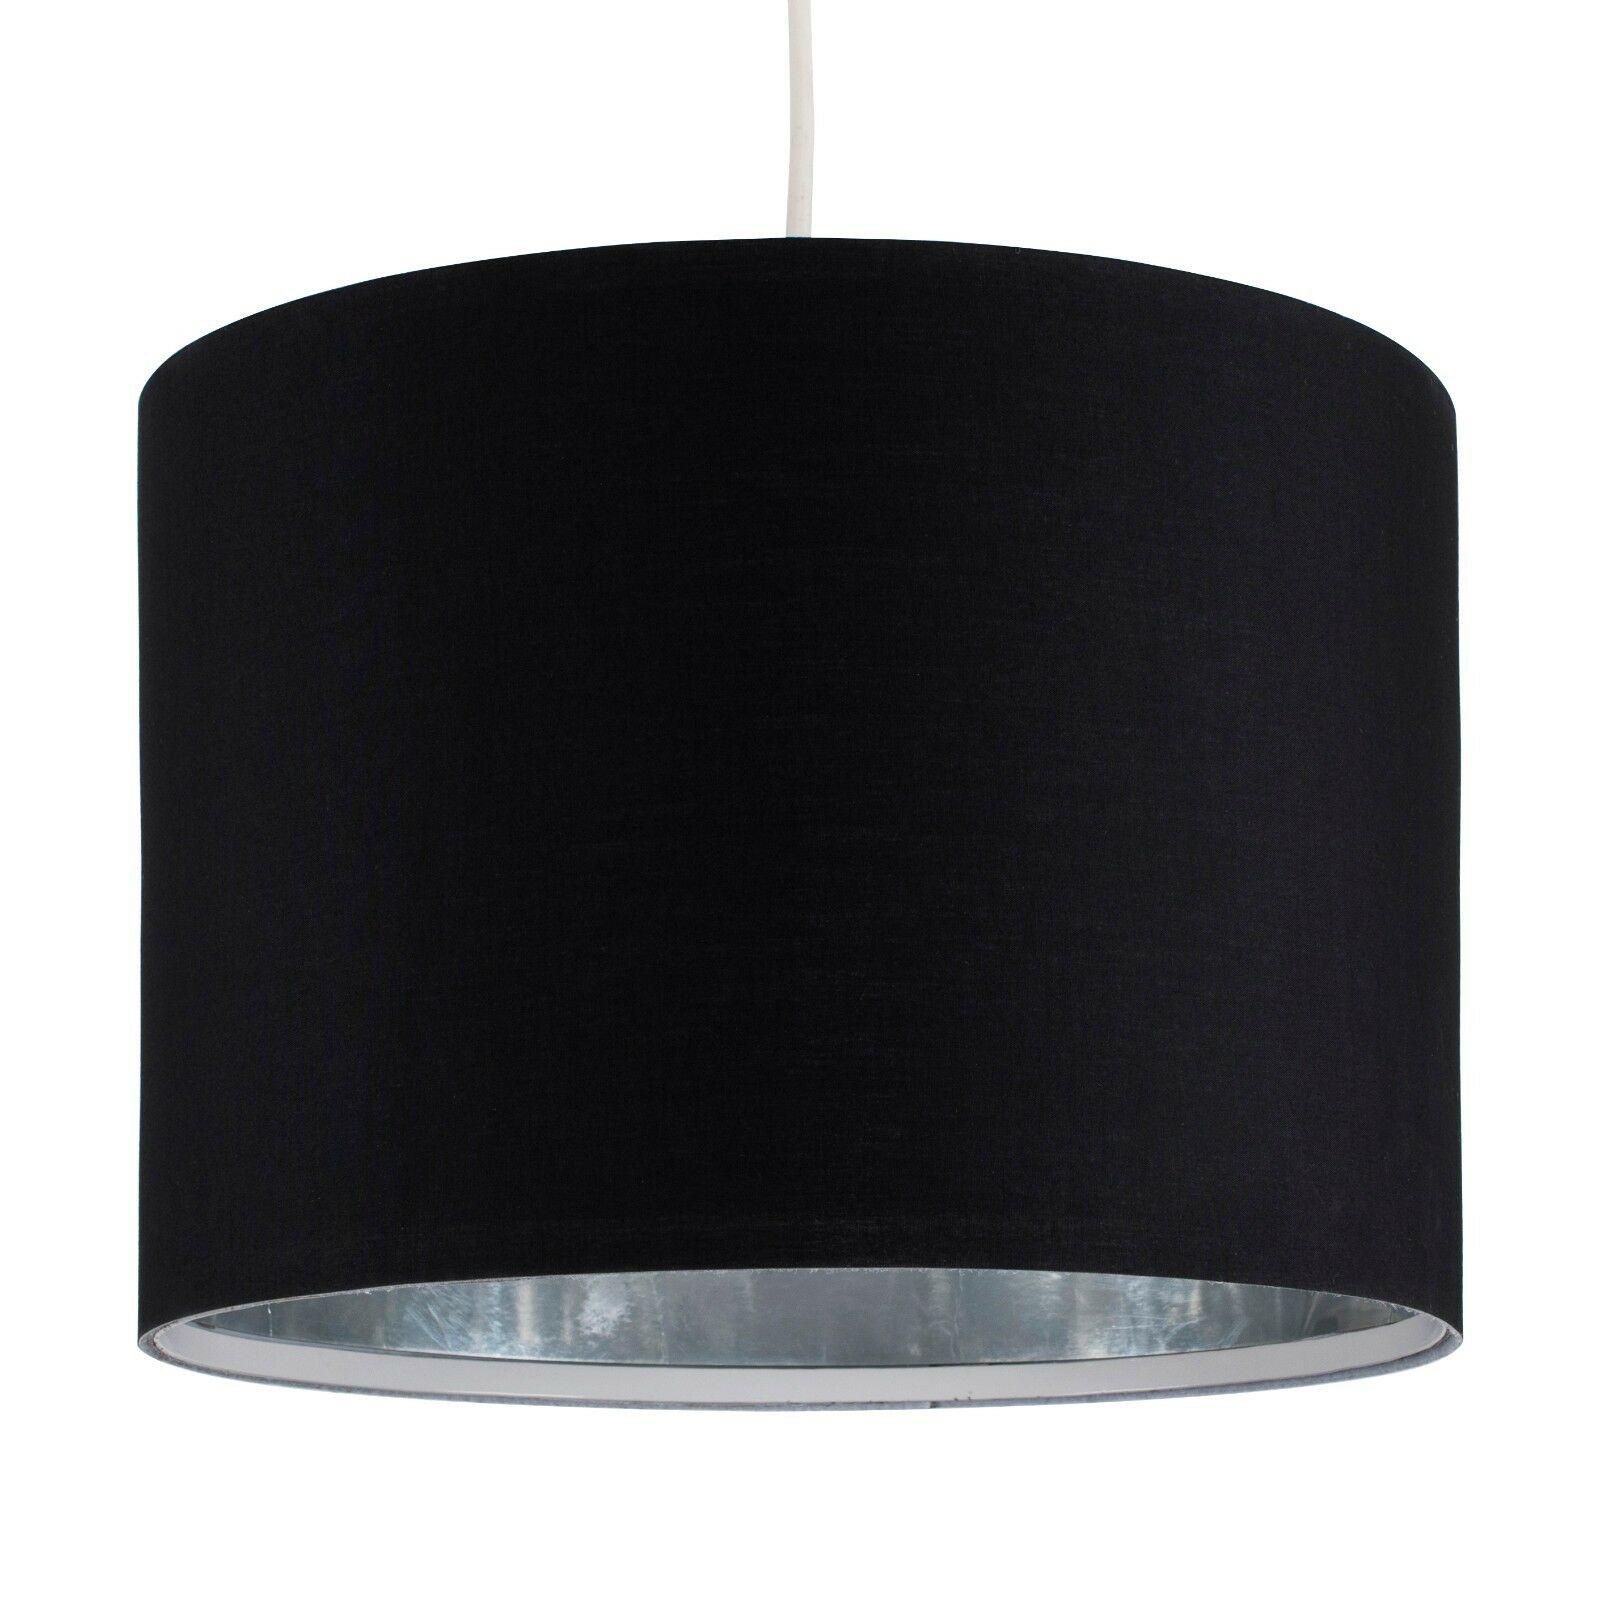 Tela-moderna-algodon-facil-ajuste-Techo-Colgante-Pantalla-De-Mesa-tonos-de-luz-de-tambor miniatura 22